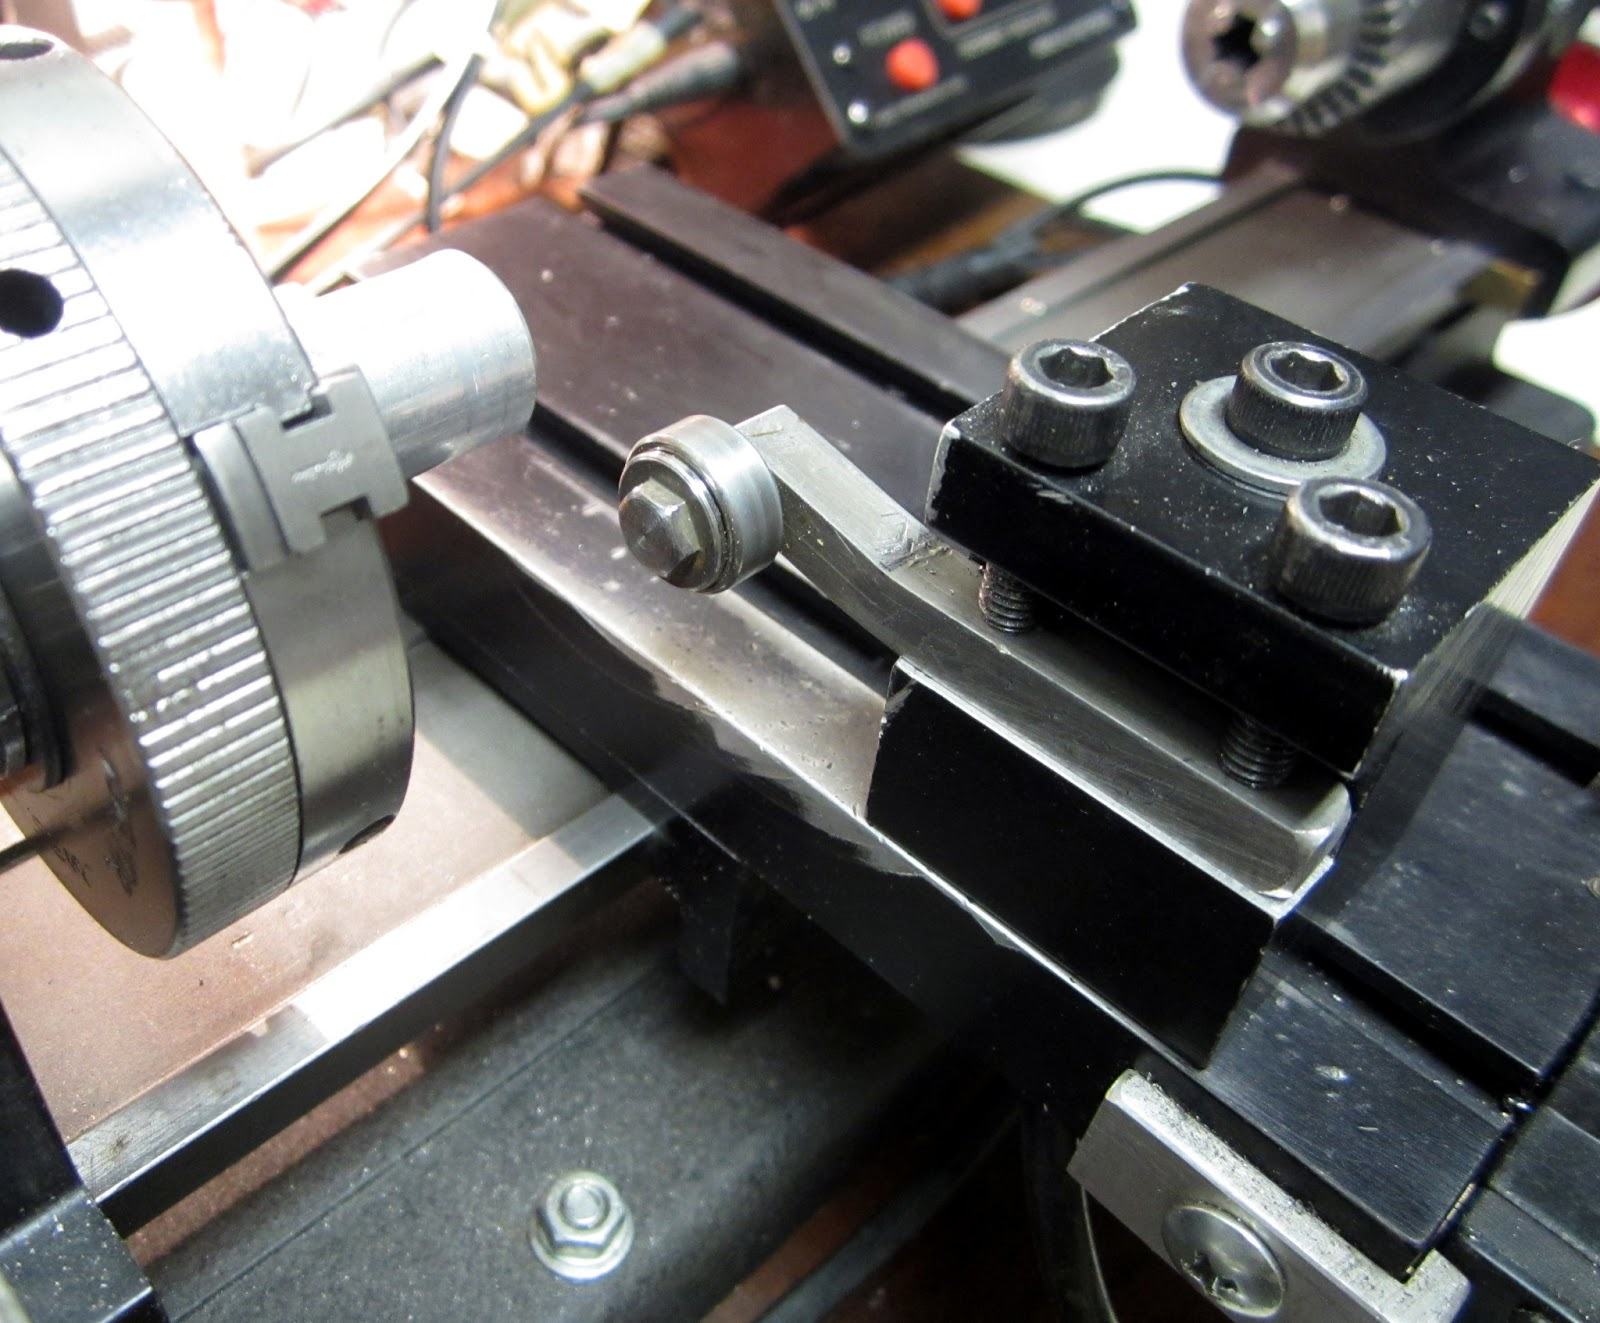 MI Shop Tools Inventions: Sherline Lathe - Workpiece